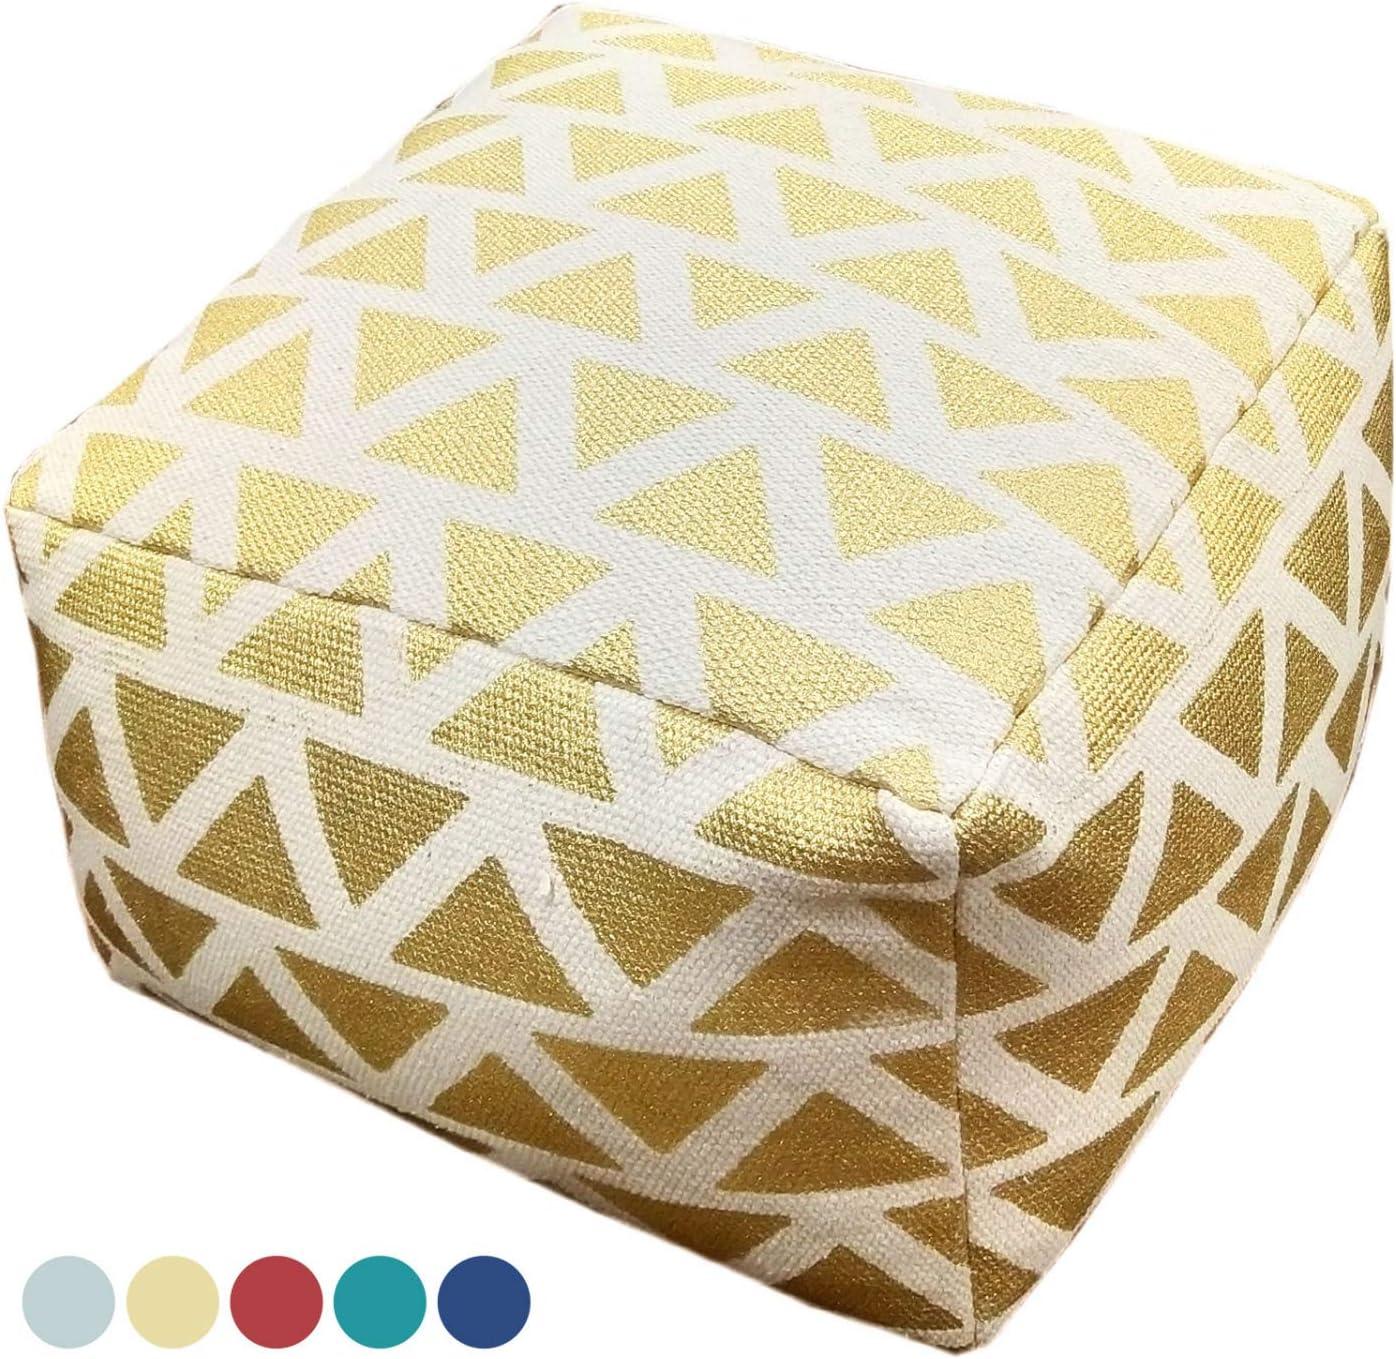 casamia Sitzhocker Sitzwürfel 55x37x55 cm Fußhocker Bodenkissen Design Pouf Kelim Style Maja 5 Farben Farbe metallic Gold